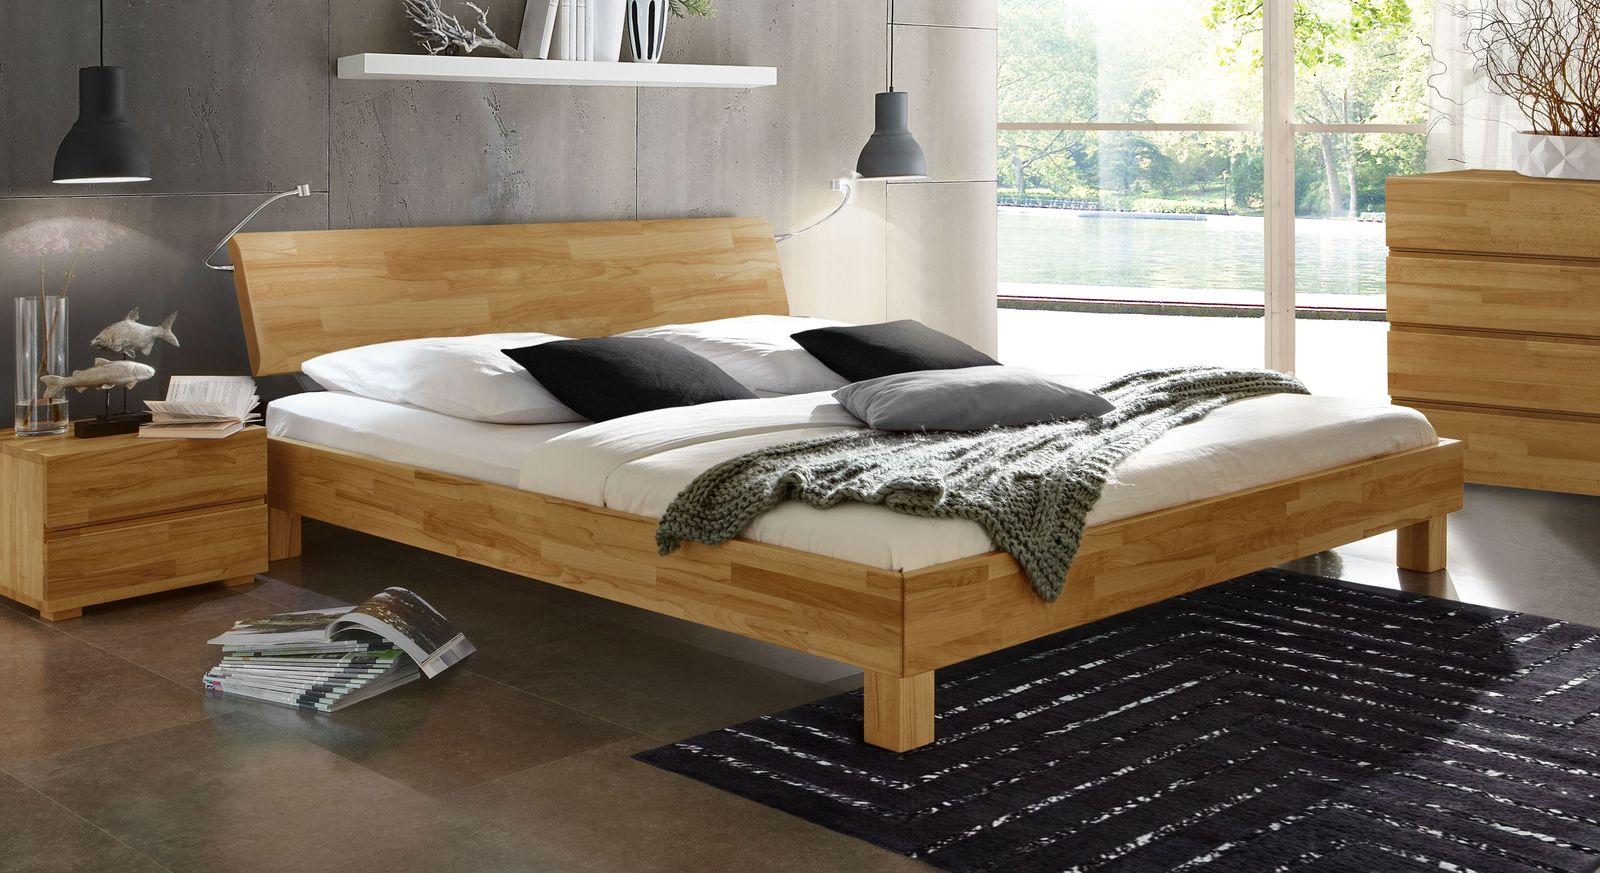 Niedriges Bett Monza in Futonhöhe